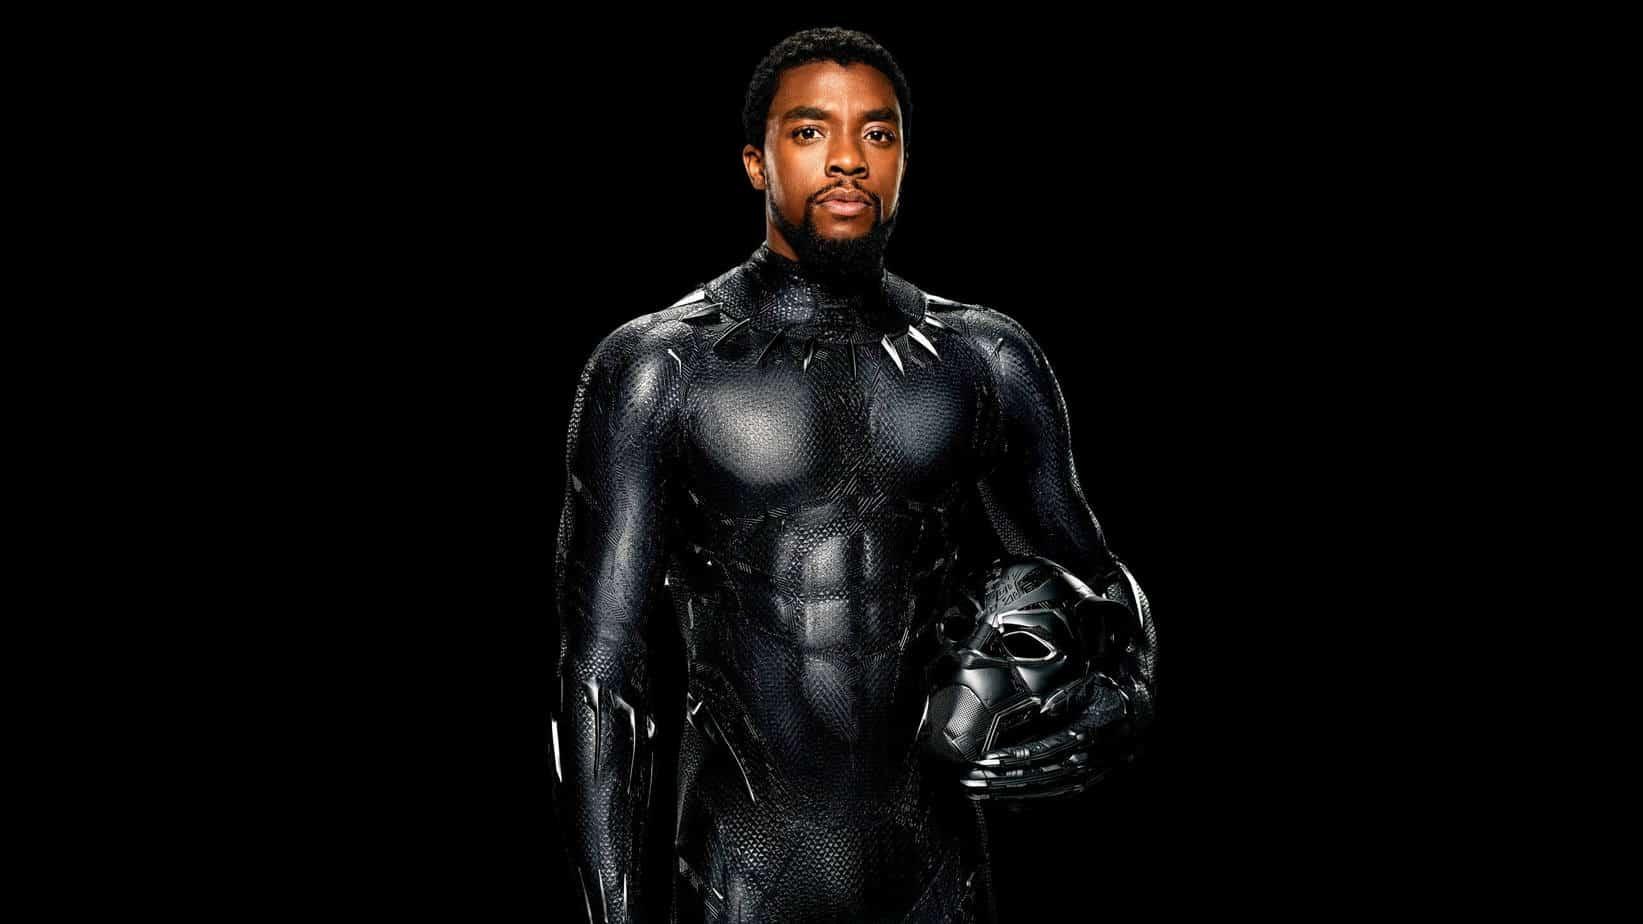 chadwick_boseman_as_black_panther